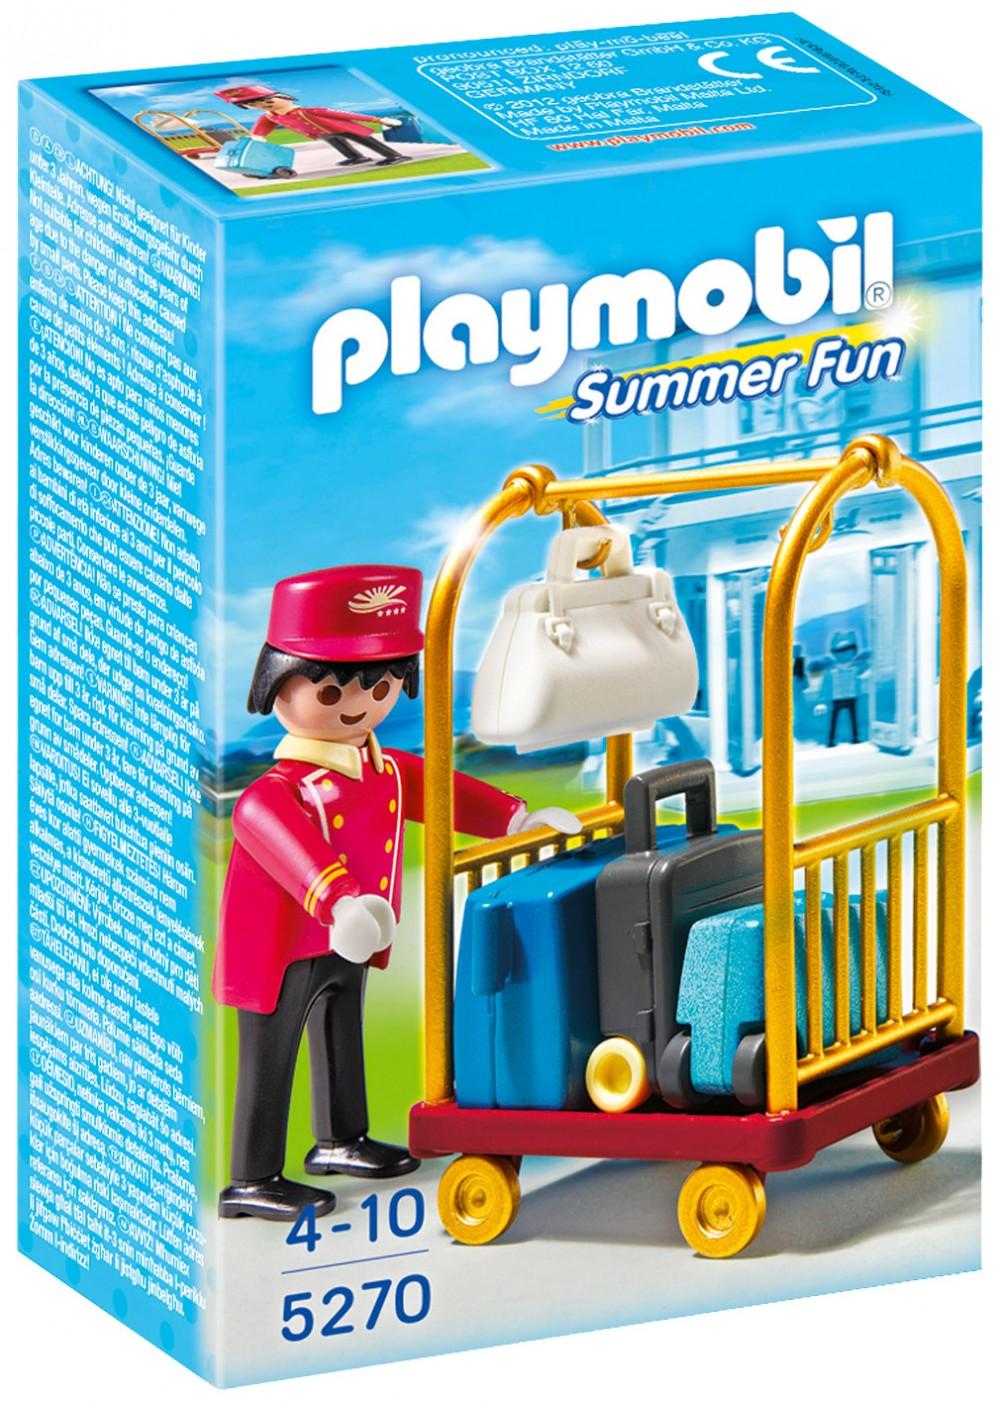 Playmobil summer fun pas cher